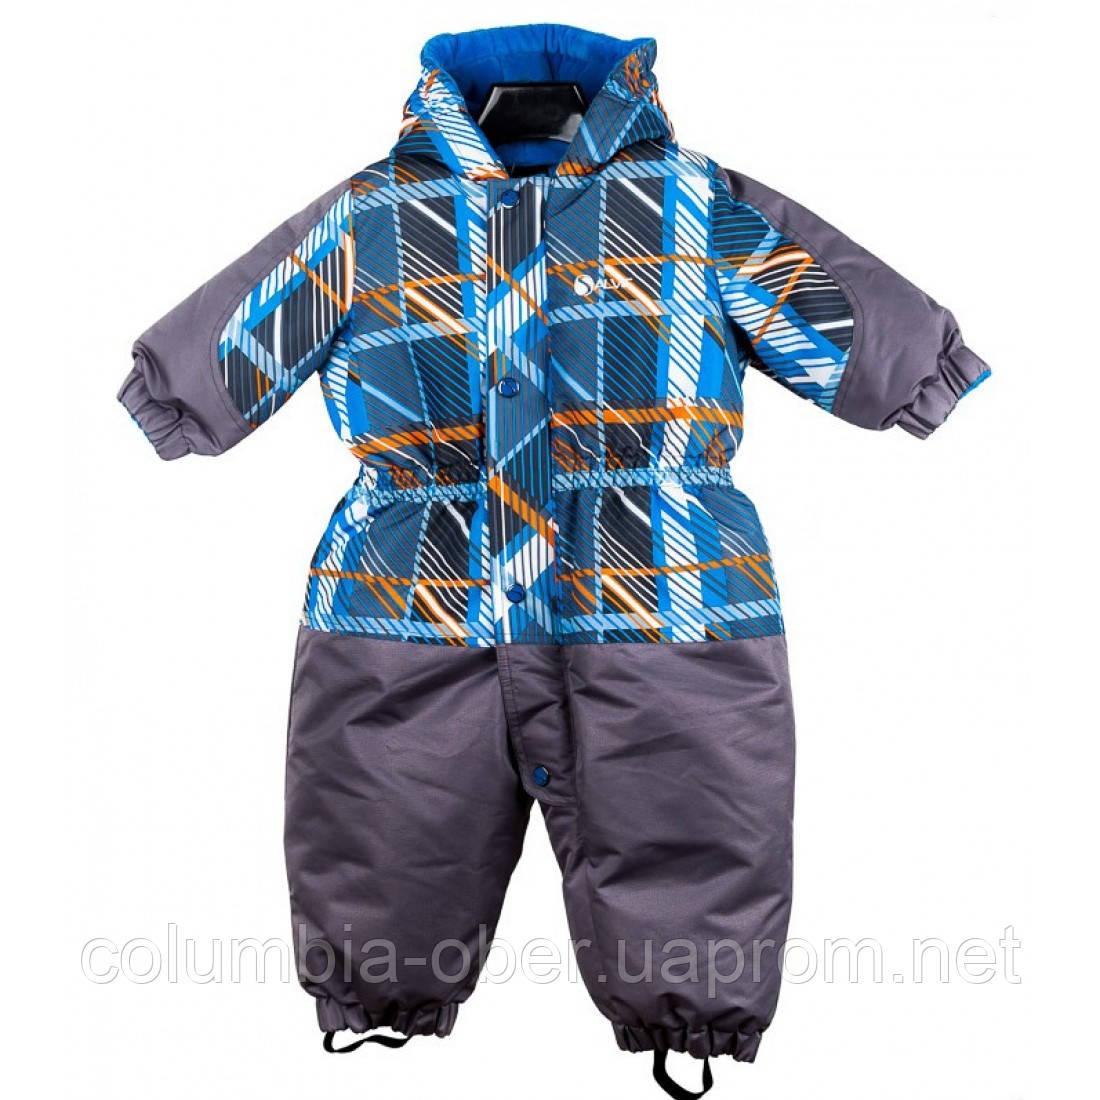 Зимний комбинезон для мальчика Salve by Gusti SWG 2594. Размеры 74 - 98.